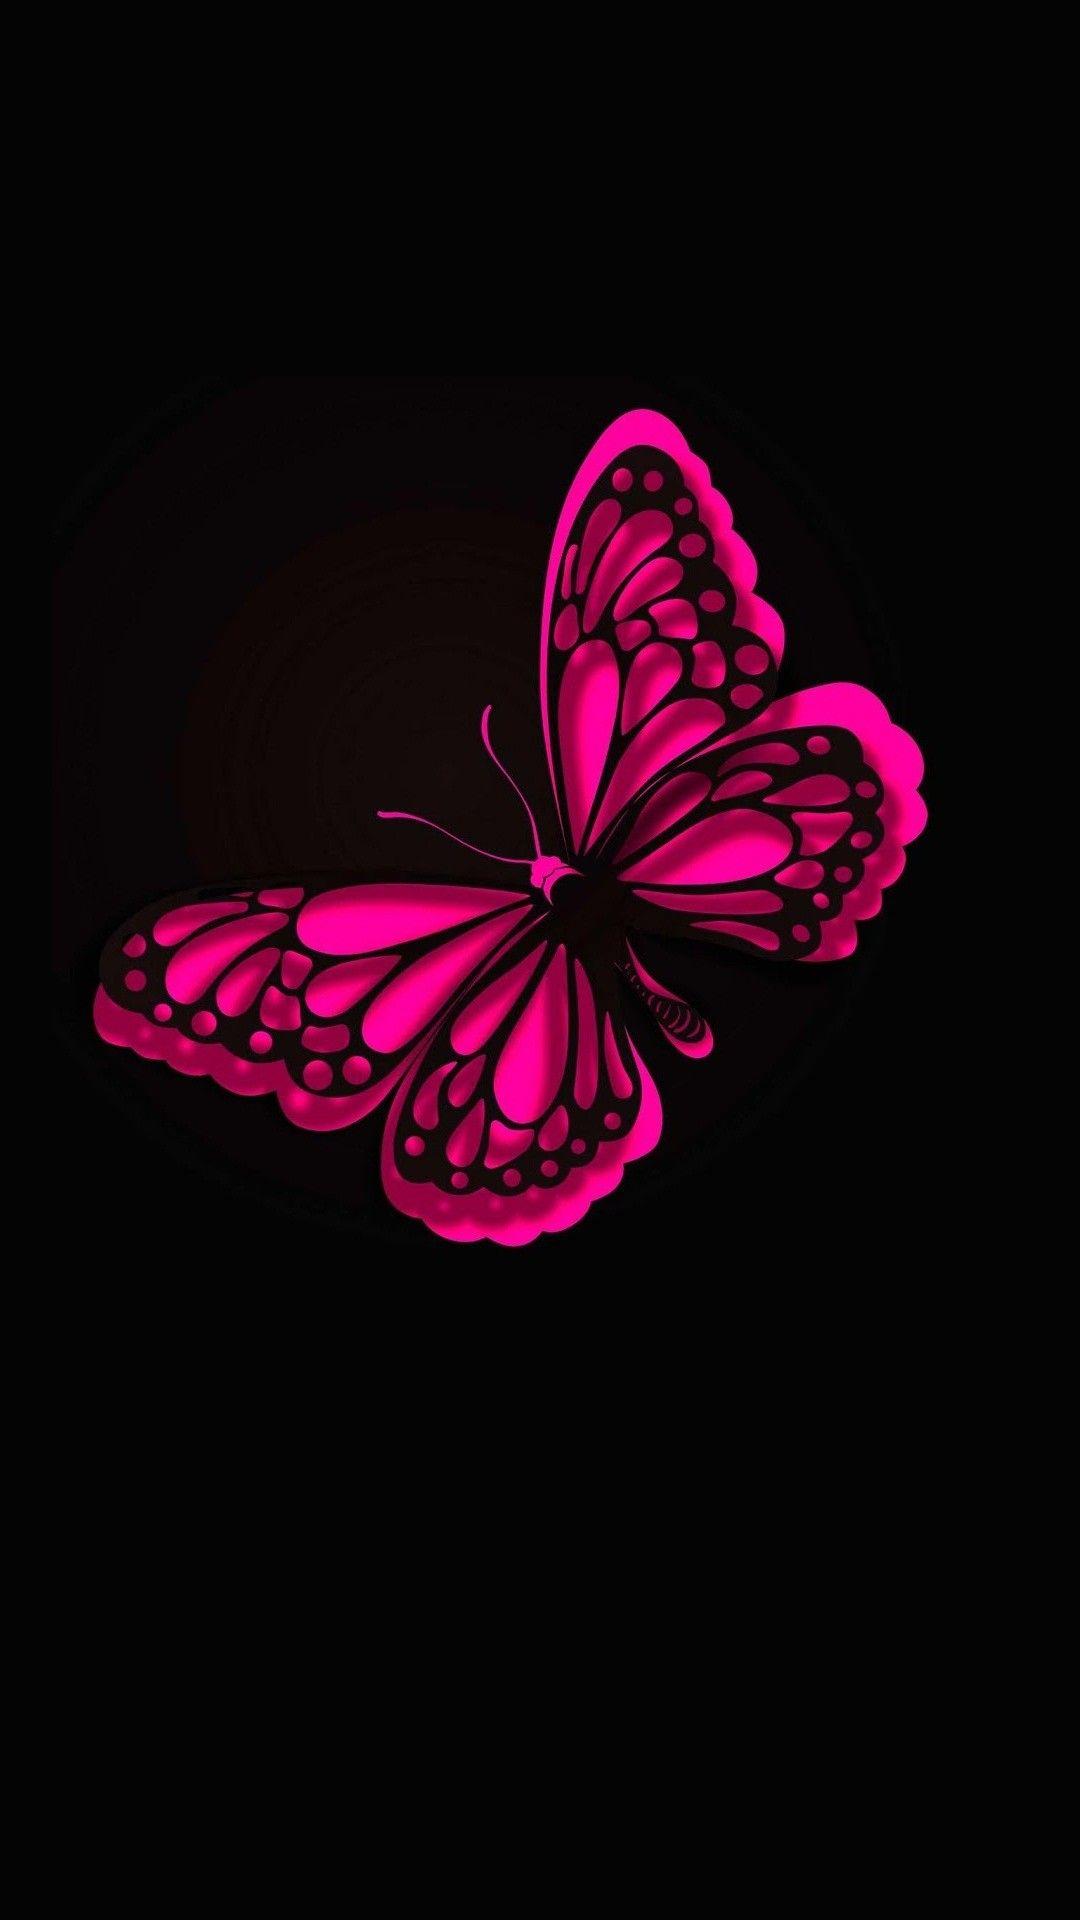 iPhone Wallpaper HD Pink Butterfly Best HD Wallpapers 1080x1920